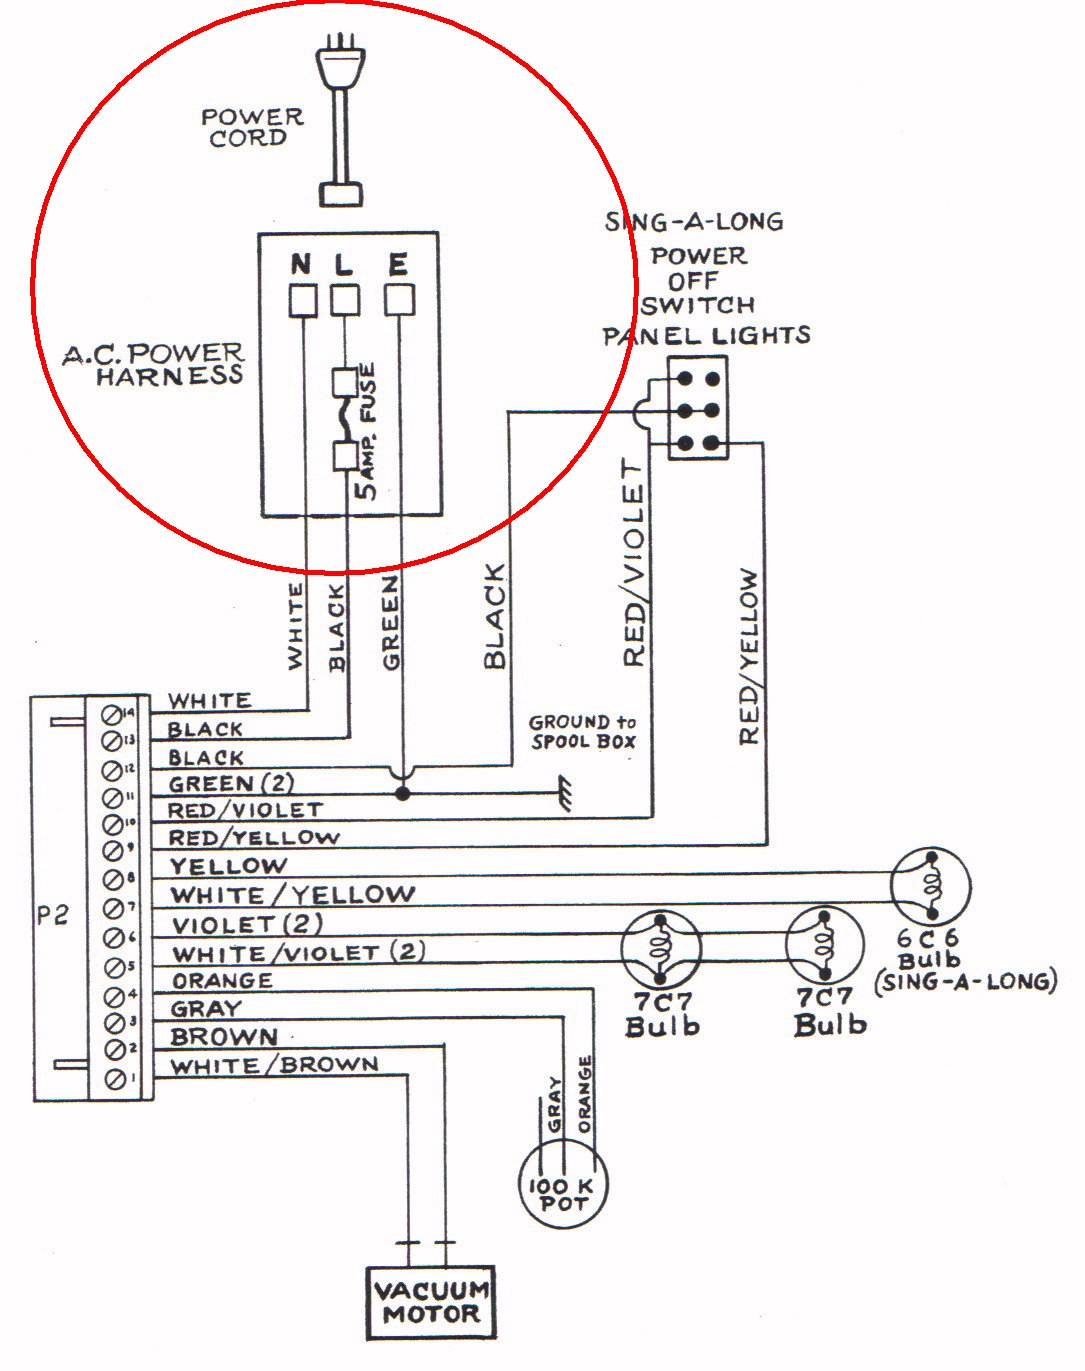 universal power cord universal p2 power cord